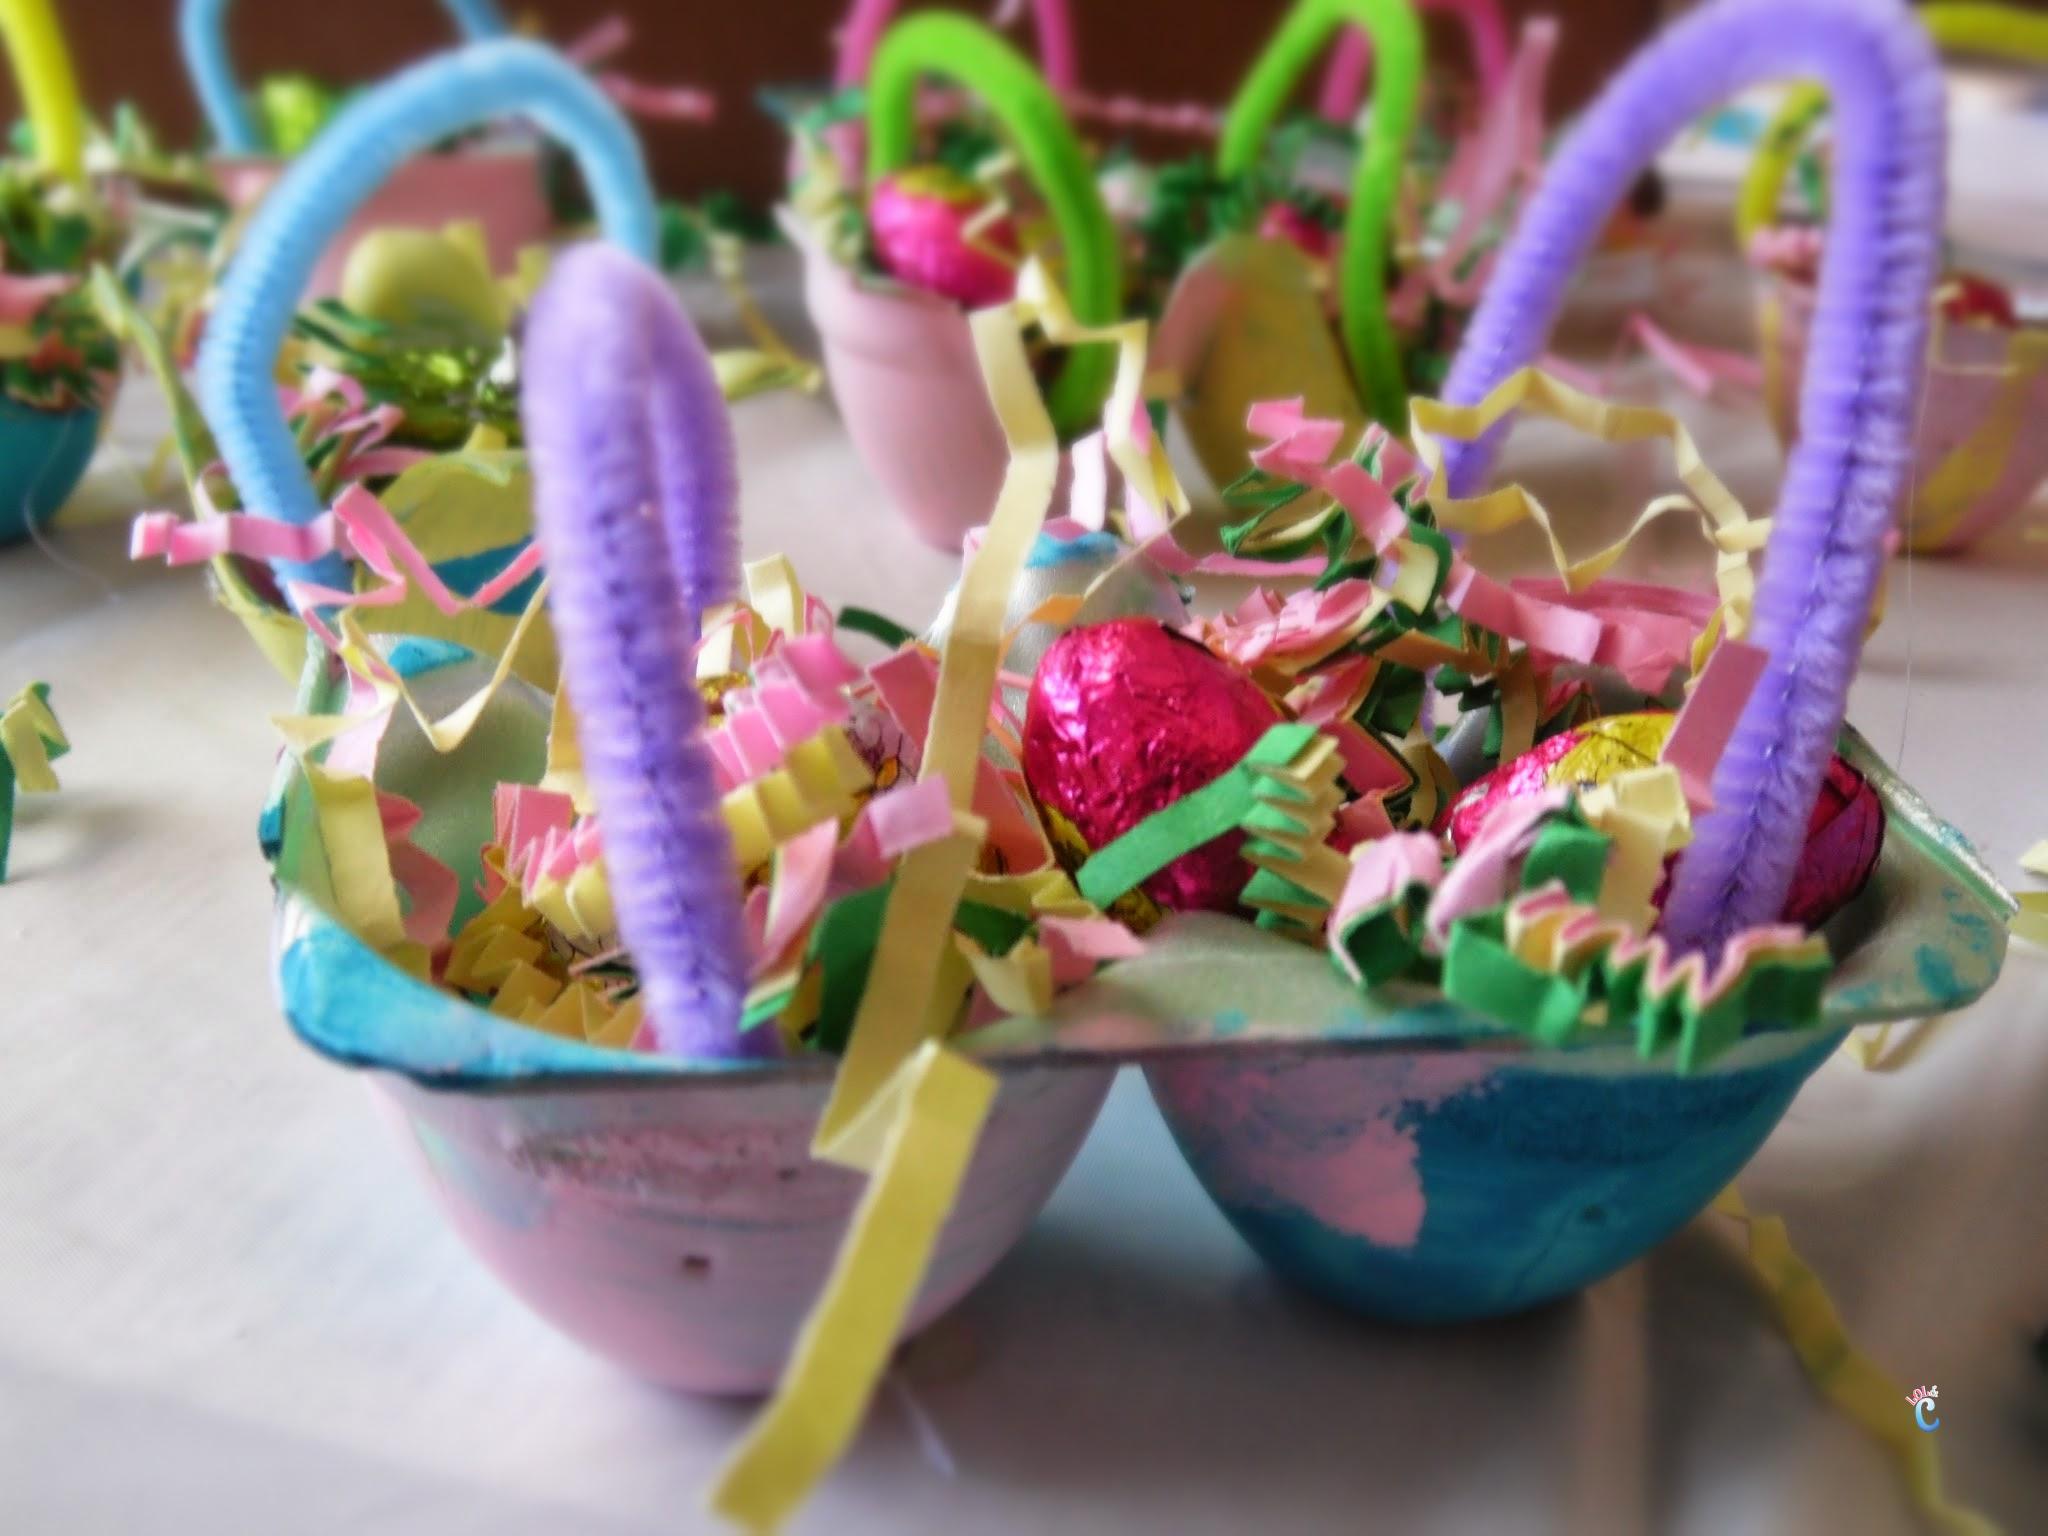 Easy Easter Craft For Kids- Make Egg Carton Easter Baskets